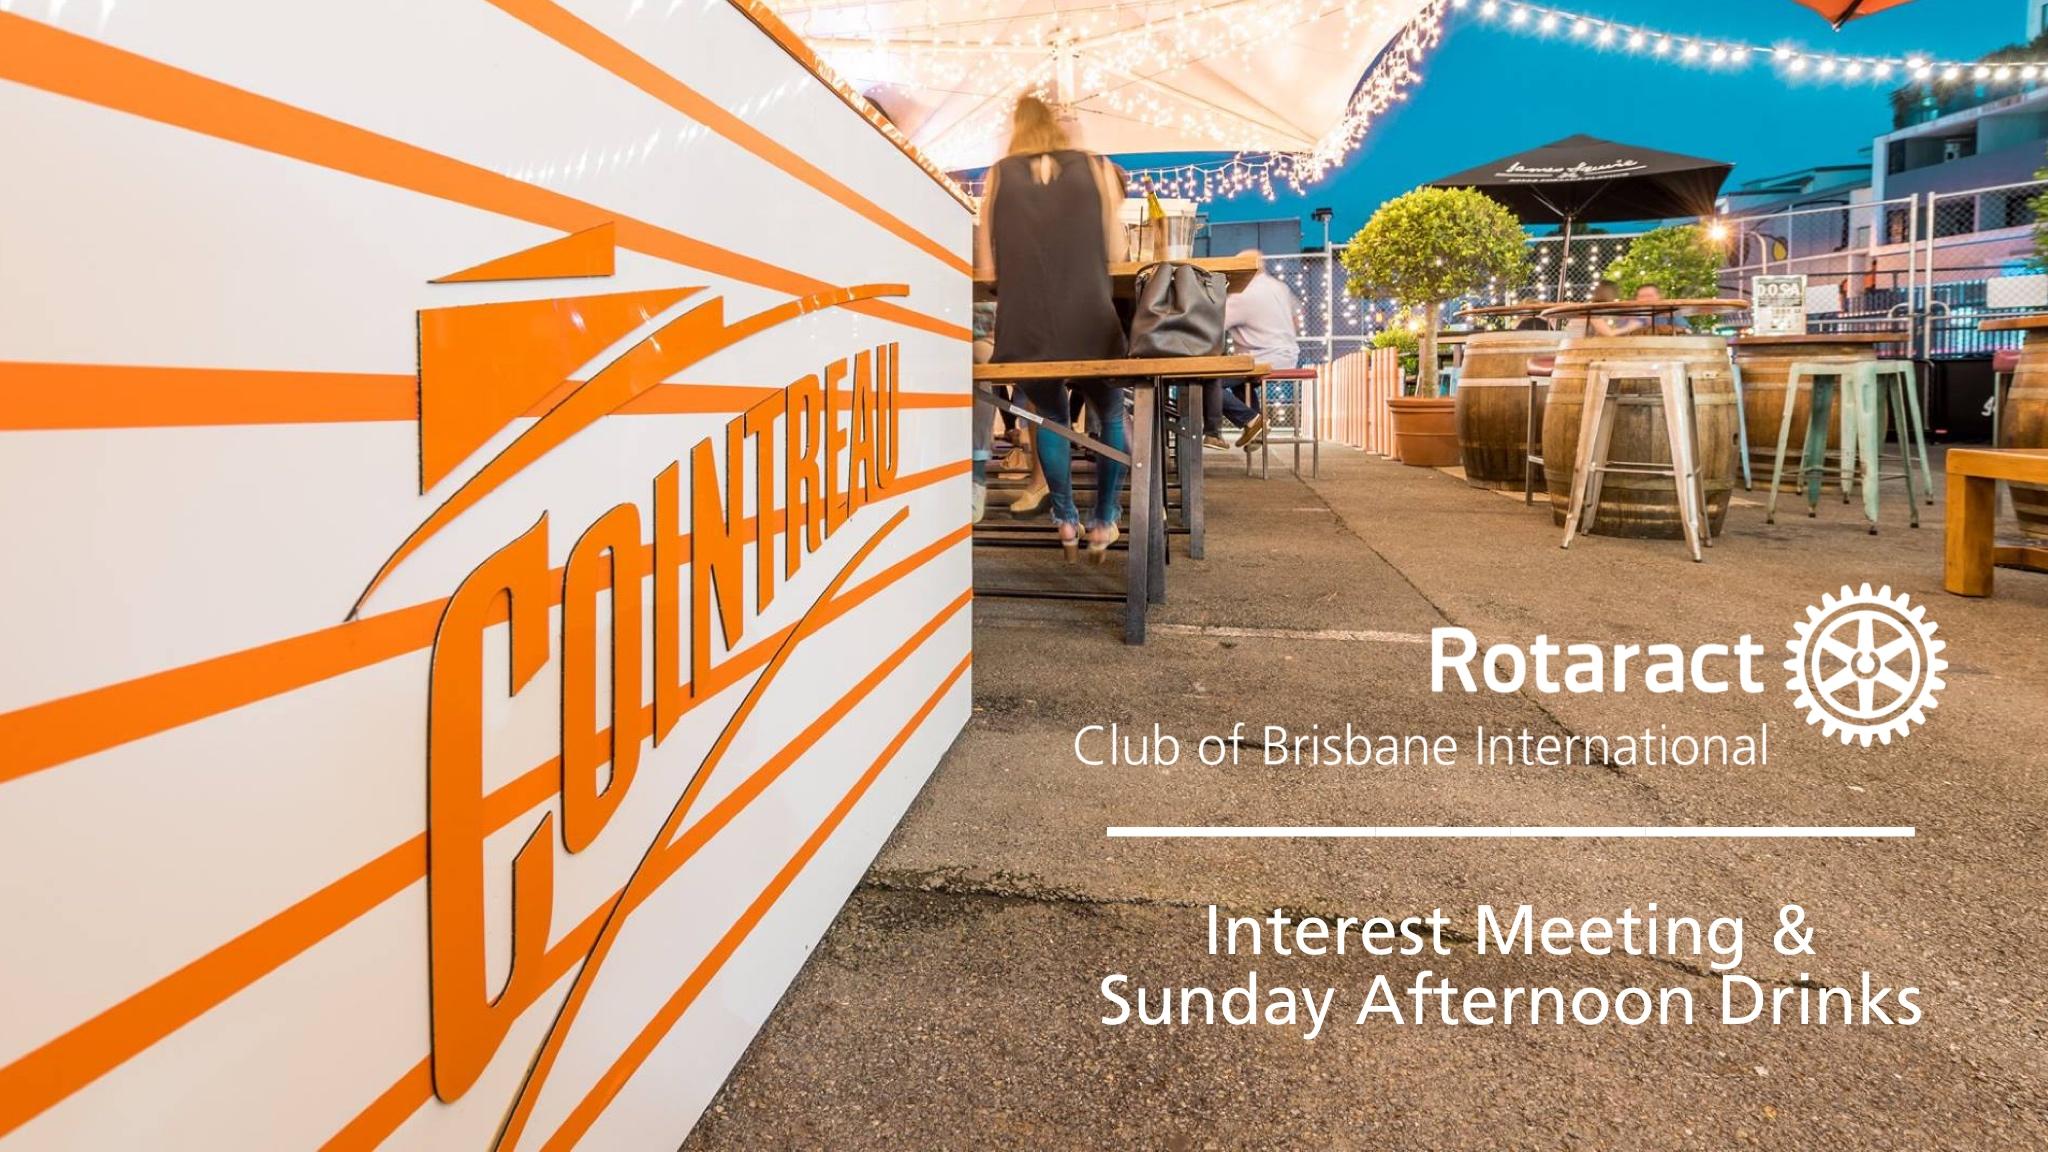 rCBI - interest meeting and sunday afternoon drinks - web use - 16_9.jpg